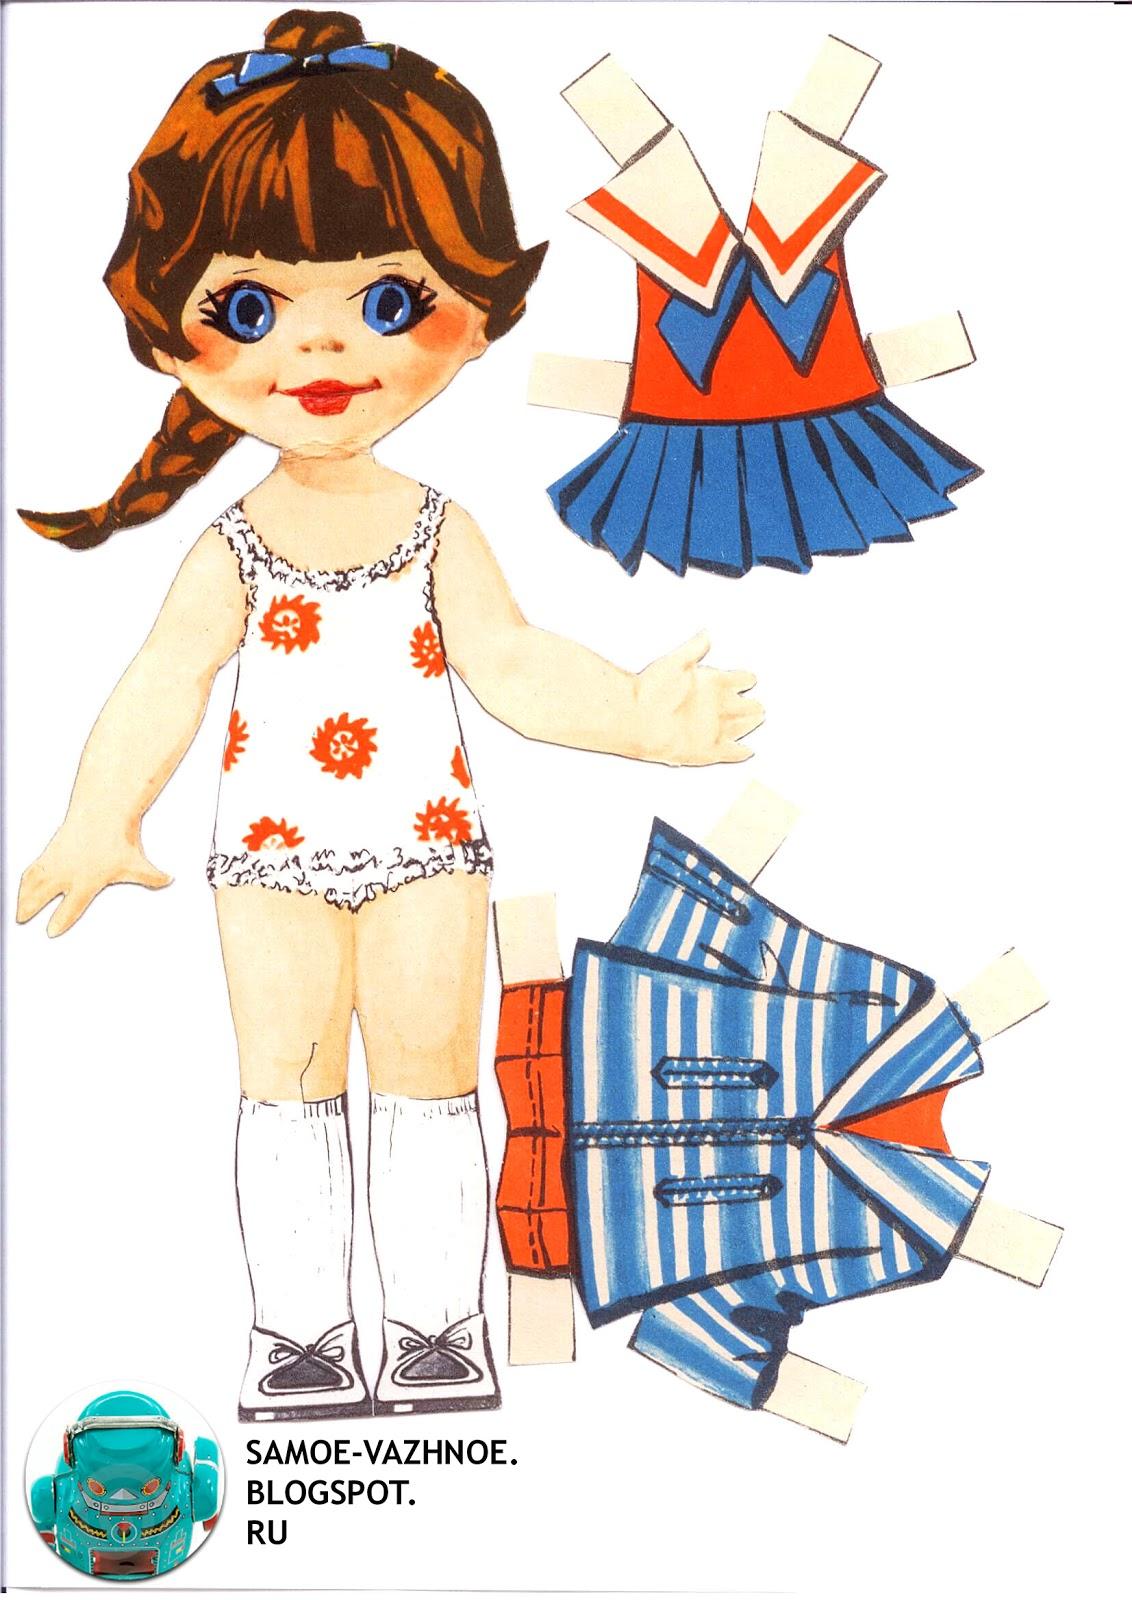 Бумажная кукла СССР тёмненькая шатенка девочка хвостик косичка улыбка